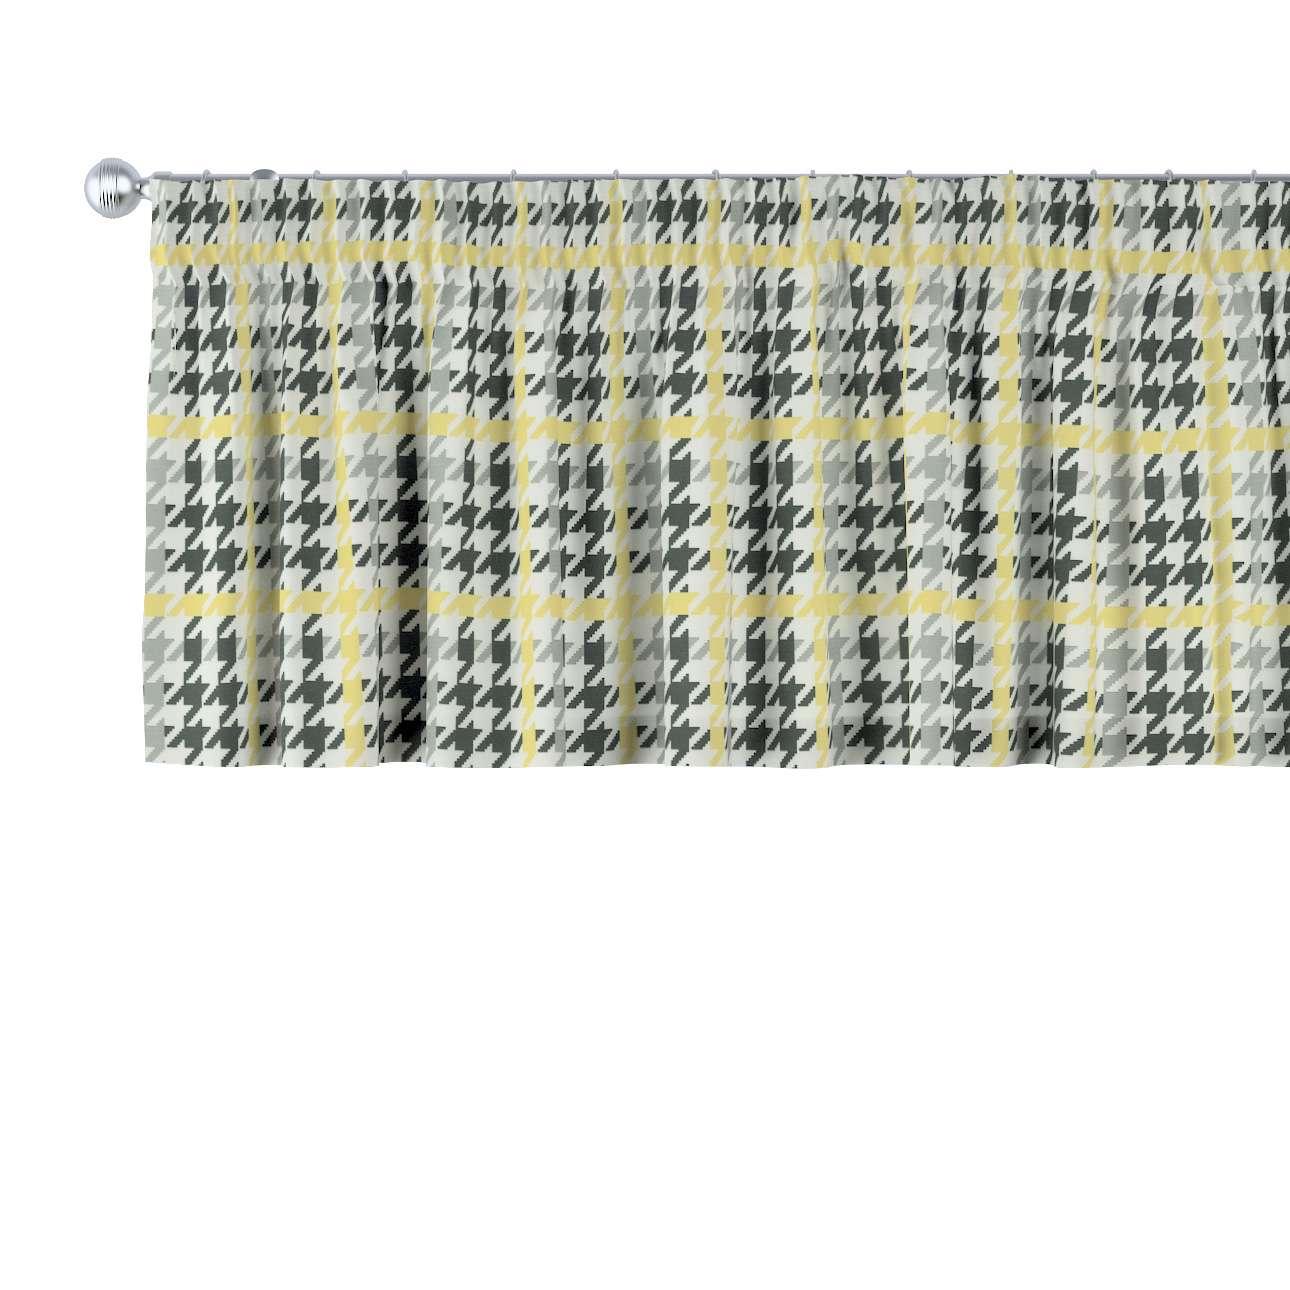 Kurzgardine mit Kräuselband 130 x 40 cm von der Kollektion Brooklyn, Stoff: 137-79